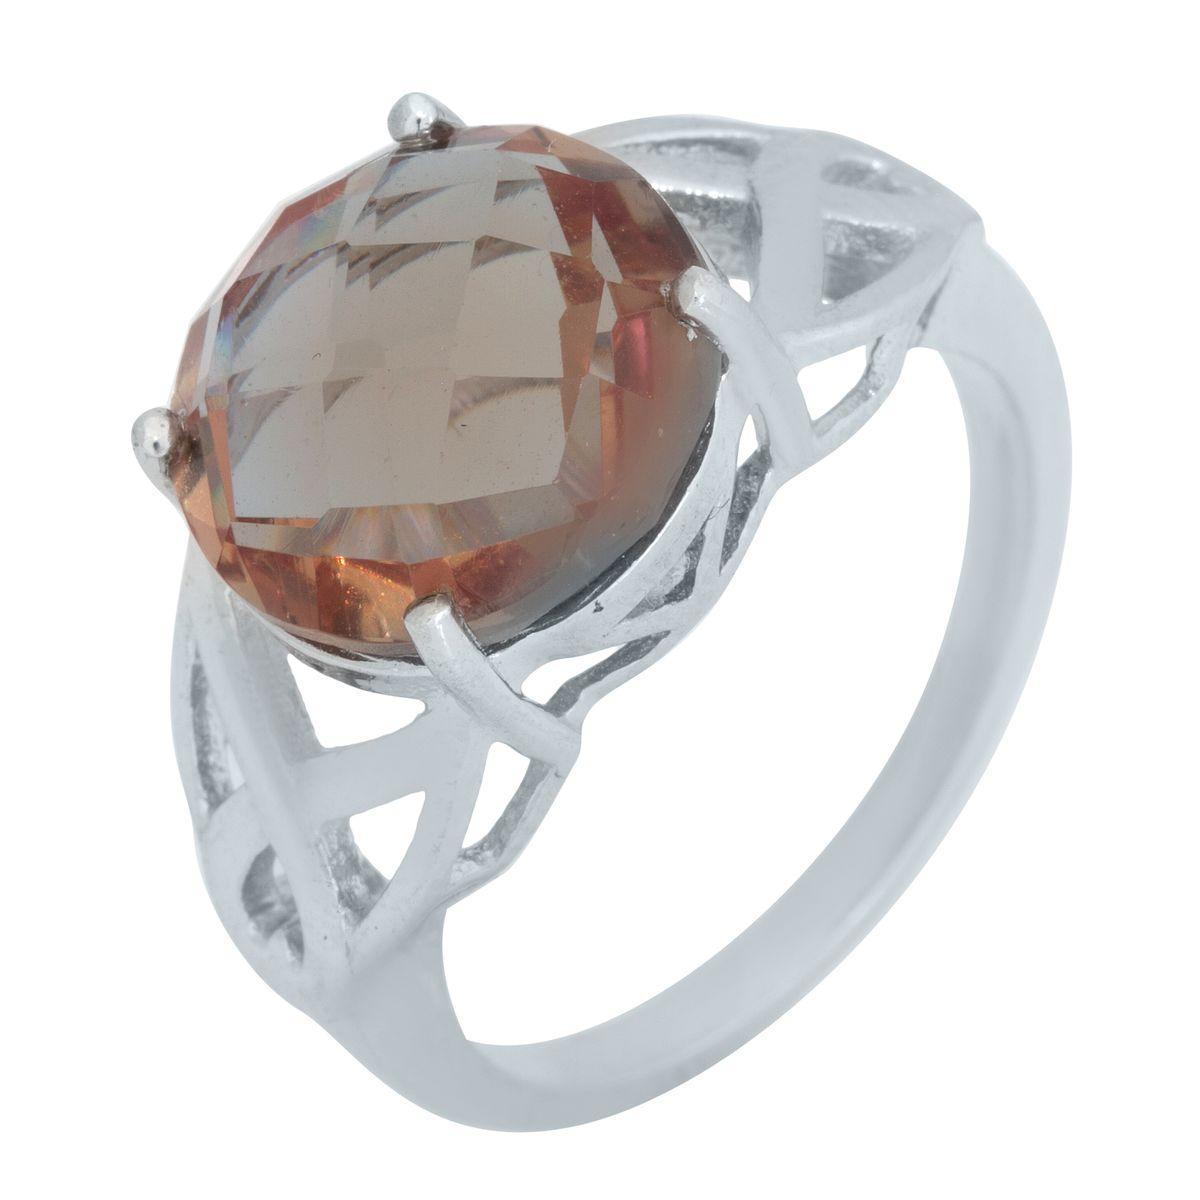 Серебряное кольцо DreamJewelry с Султанит султанитом (2007586) 17 размер